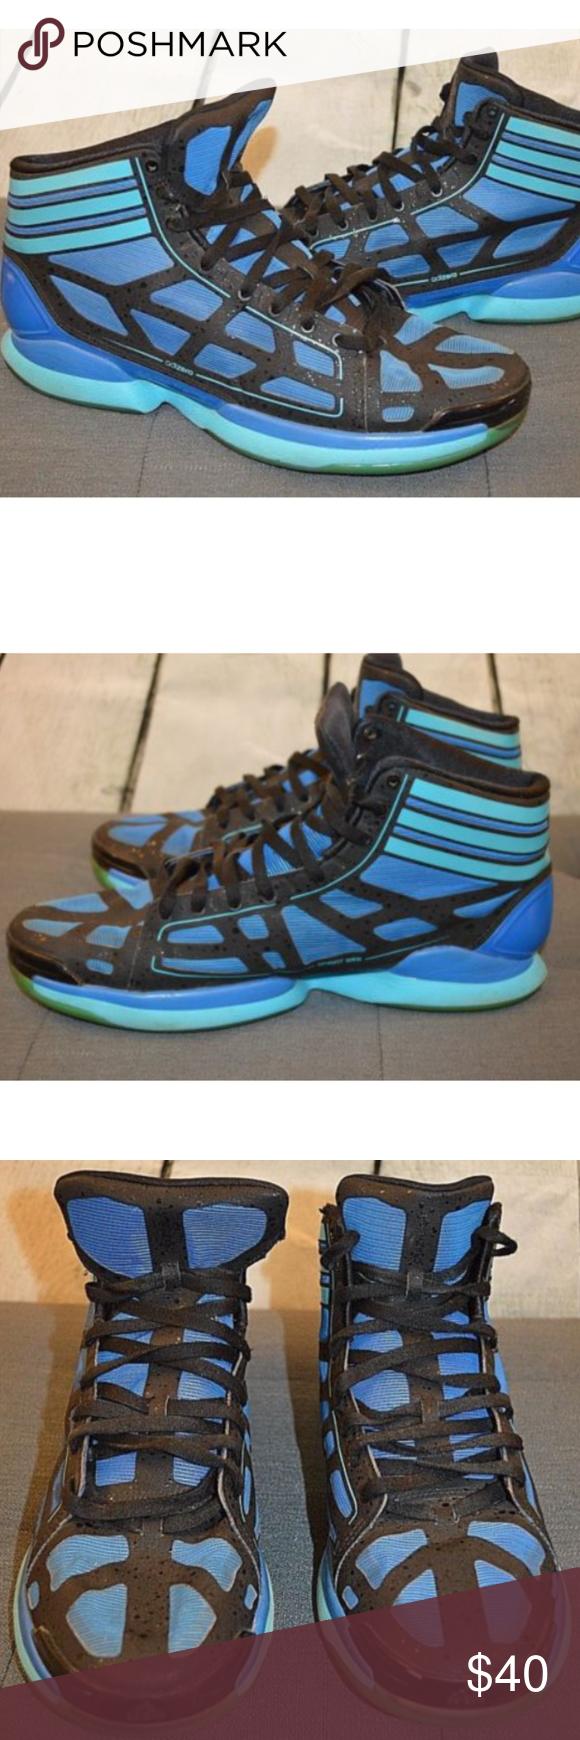 Adidas adizero negro & AZUL zapatilla zapatos 13 mi Posh Picks